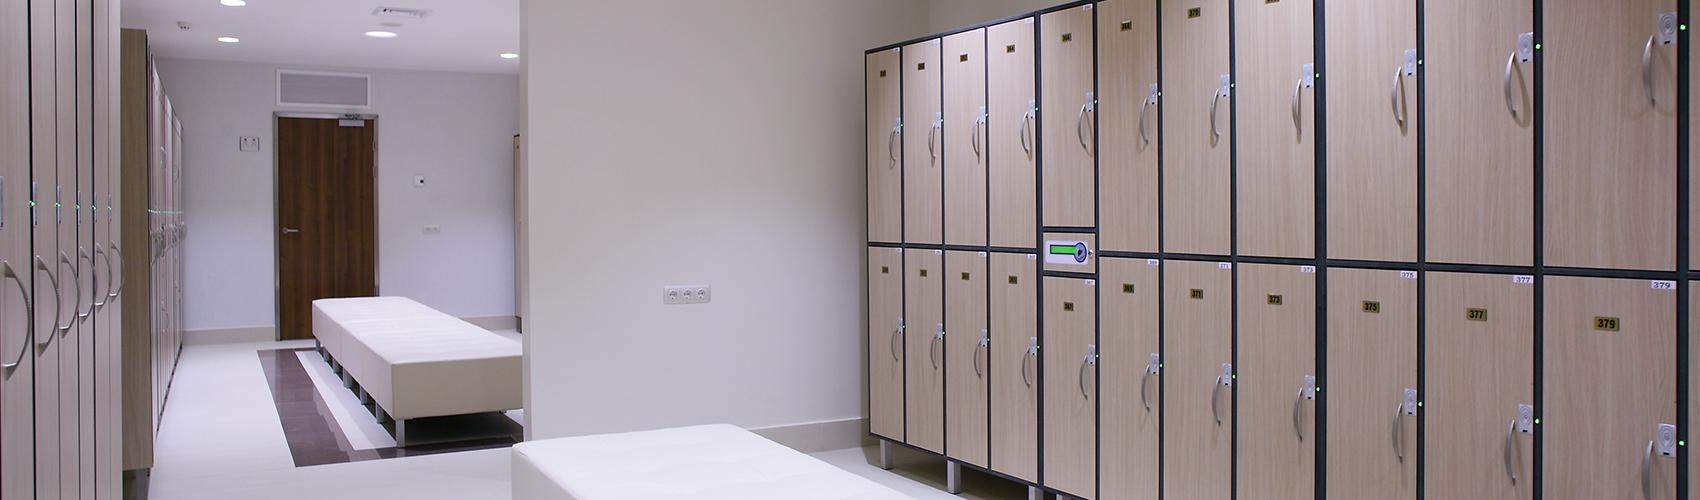 education-lockers